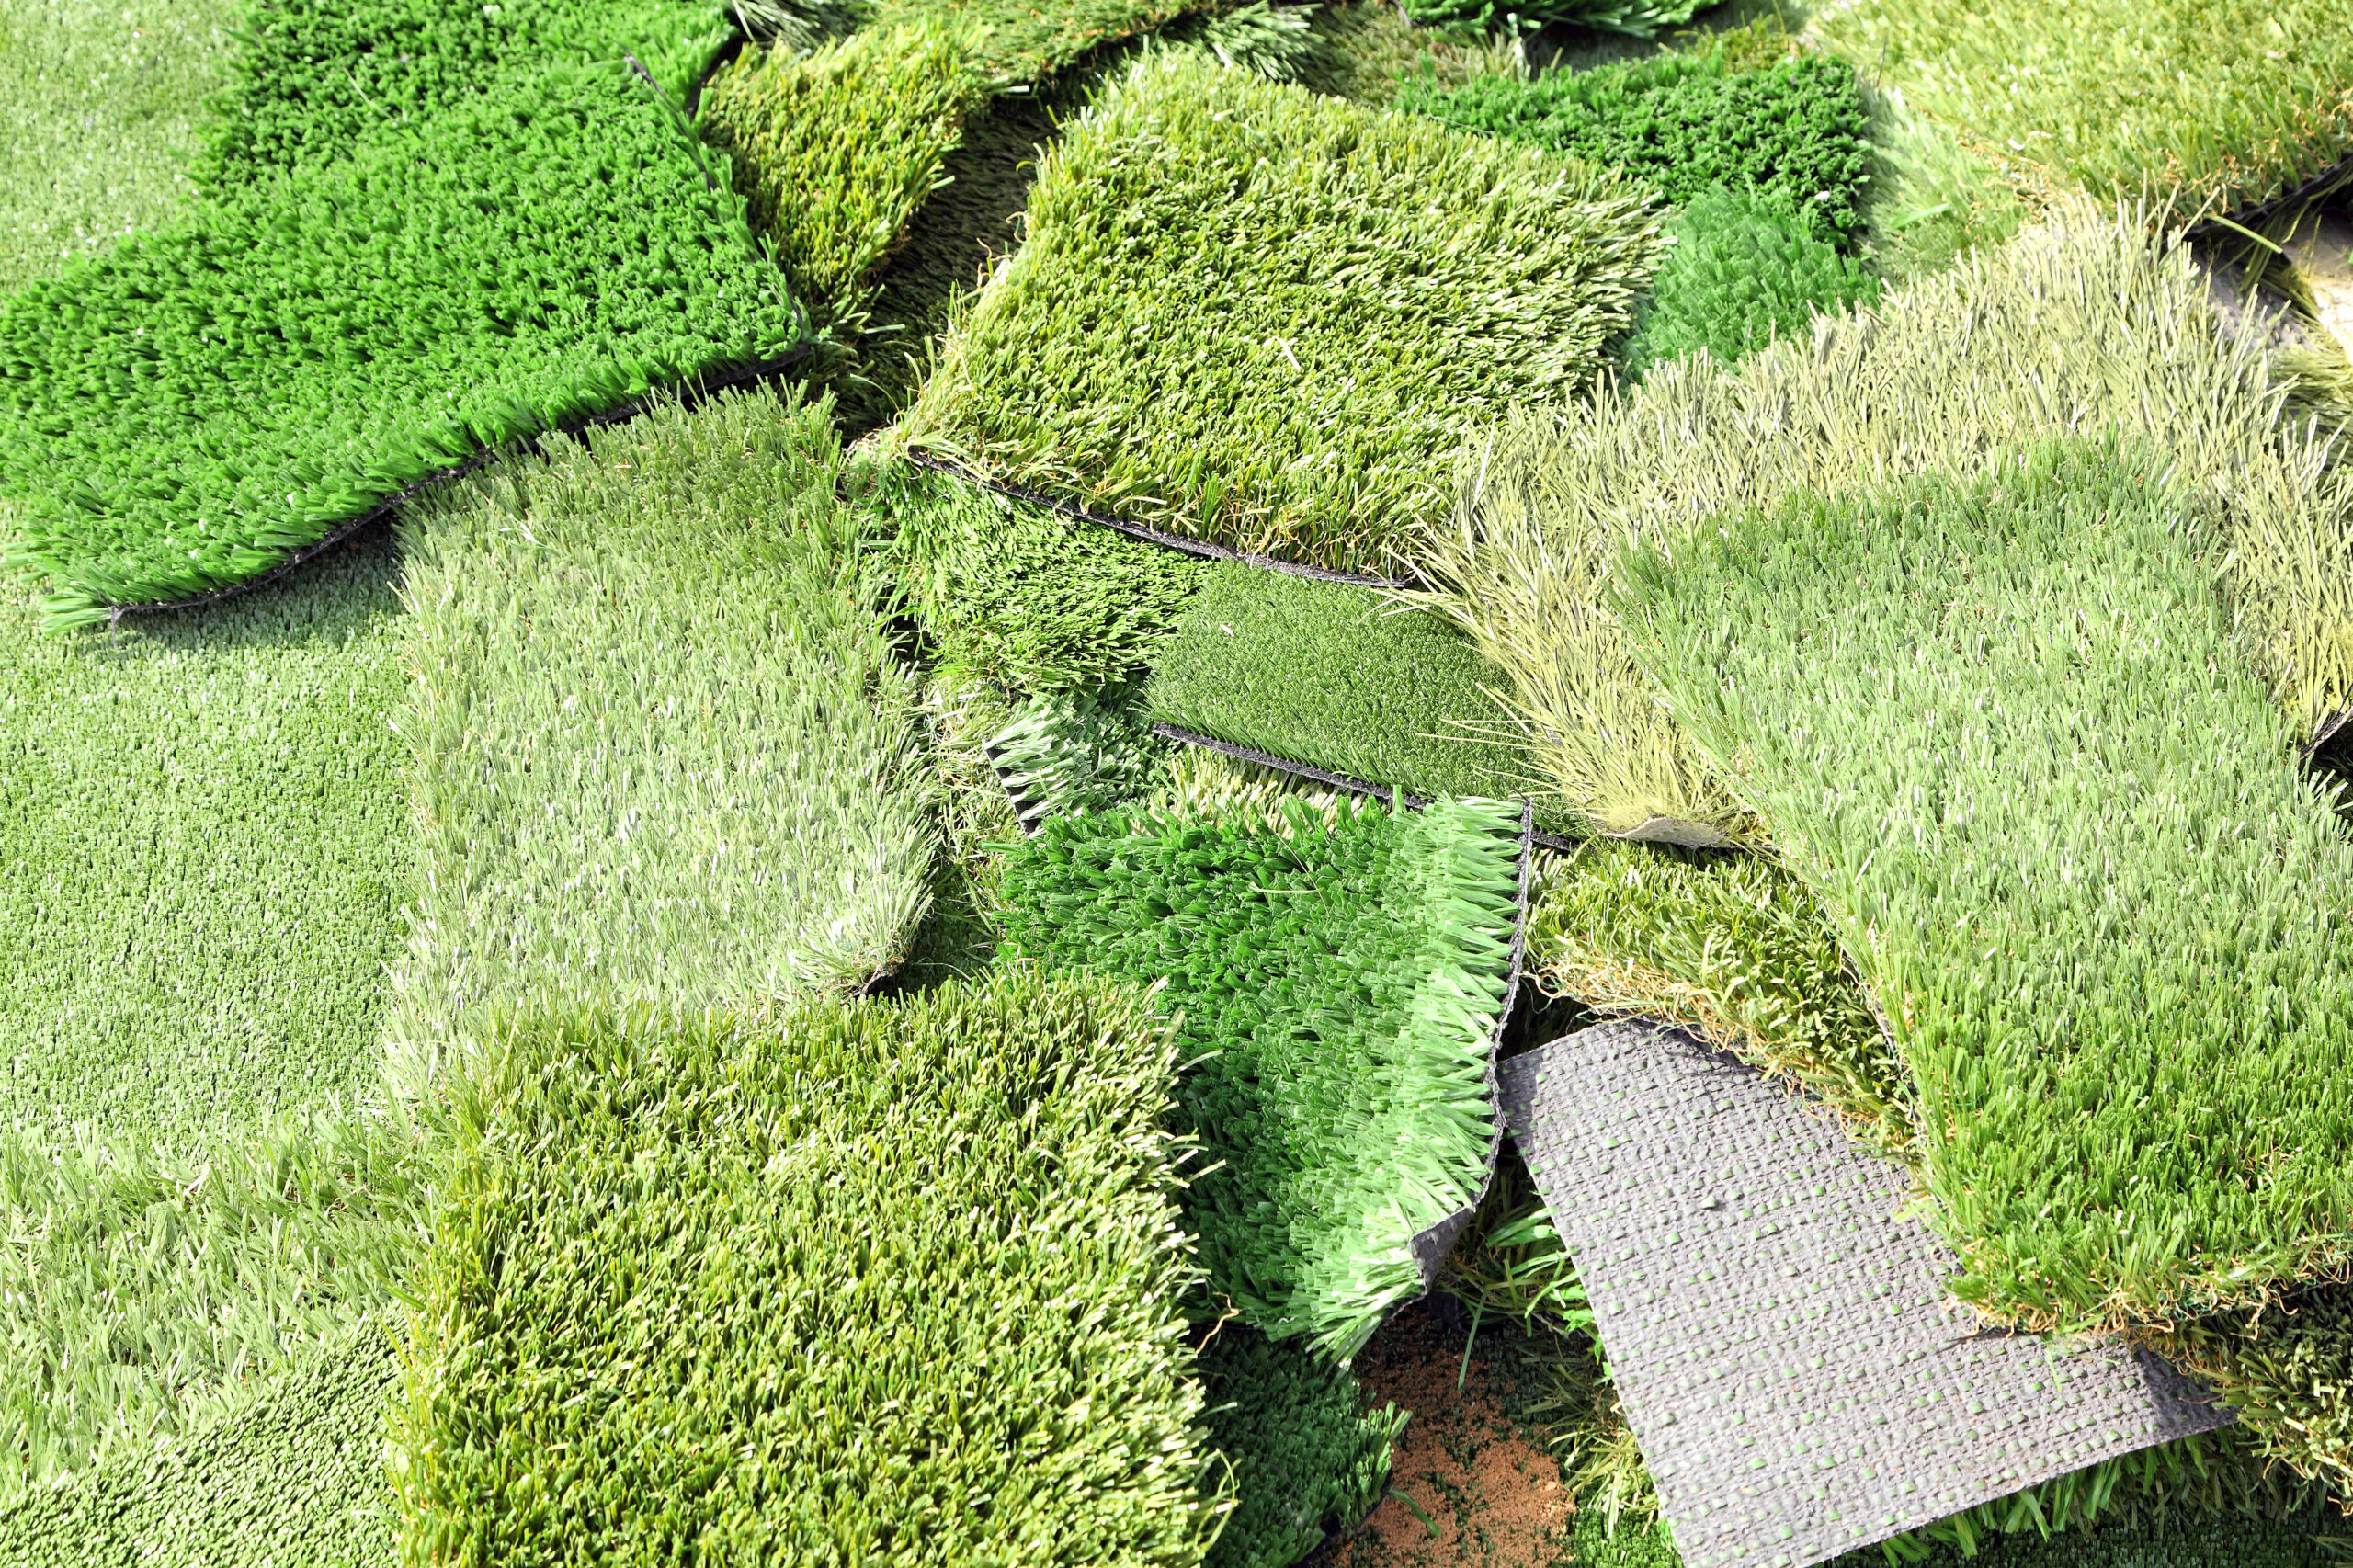 Campioni di erba sintetica